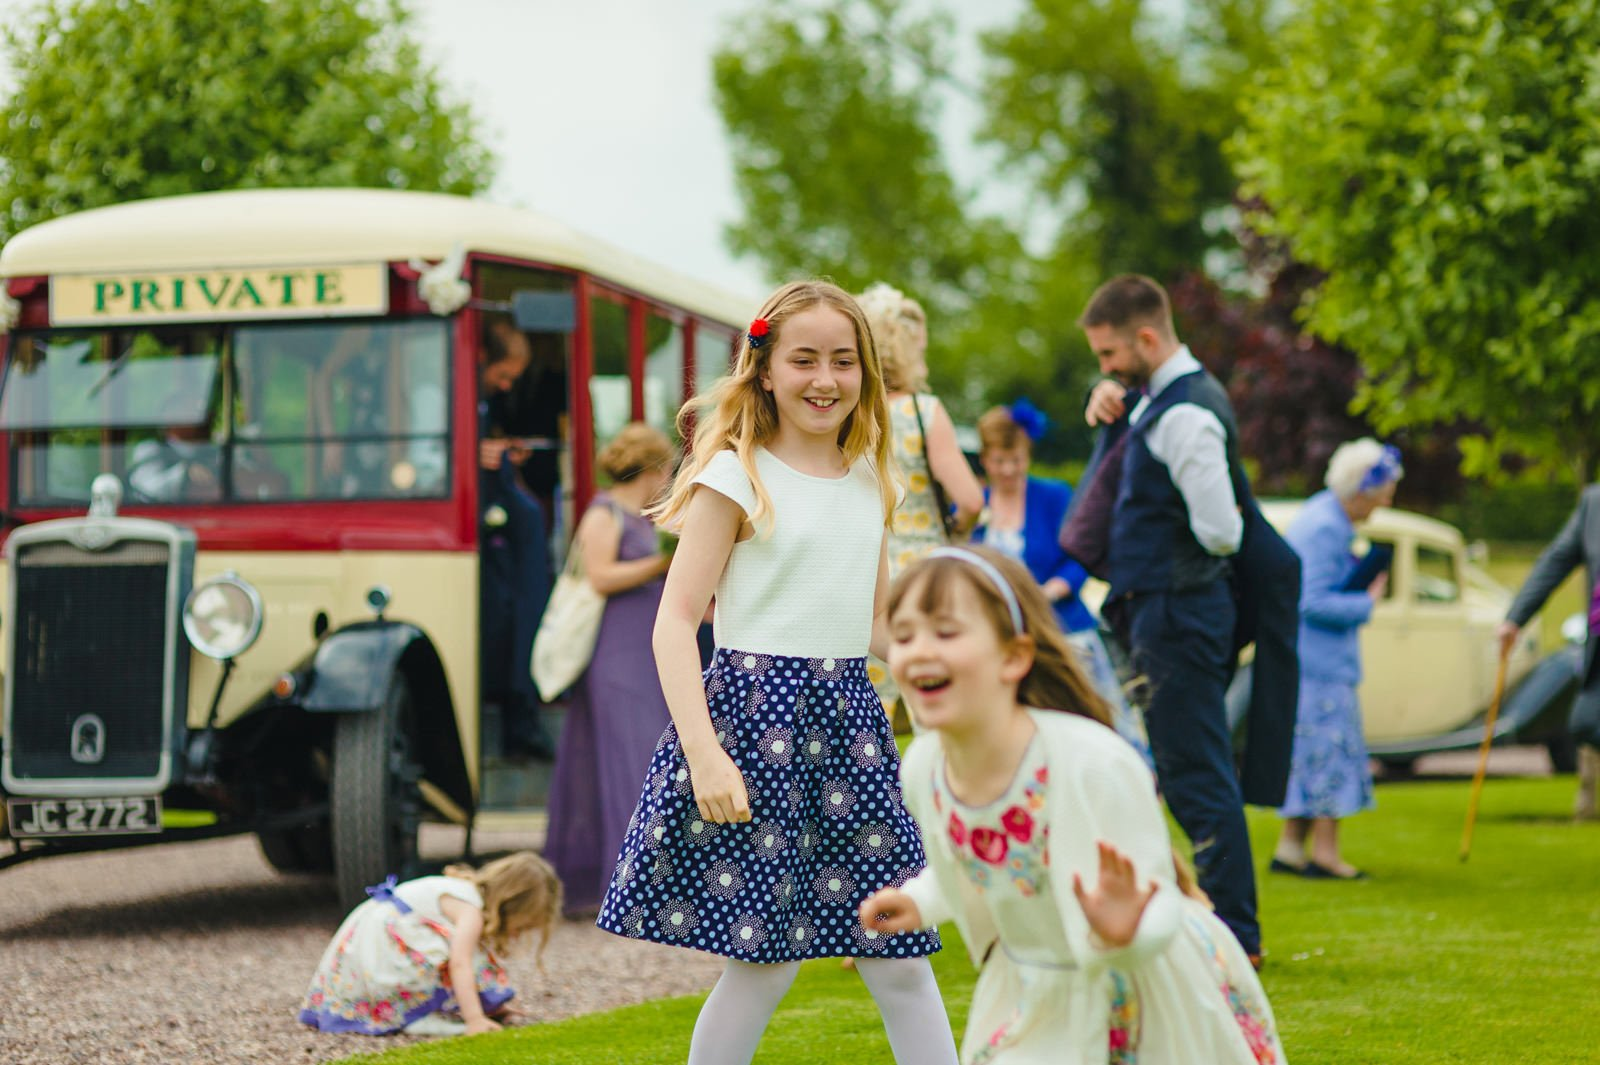 Millers Of Netley wedding, Dorrington, Shrewsbury | Emma + Ben 45